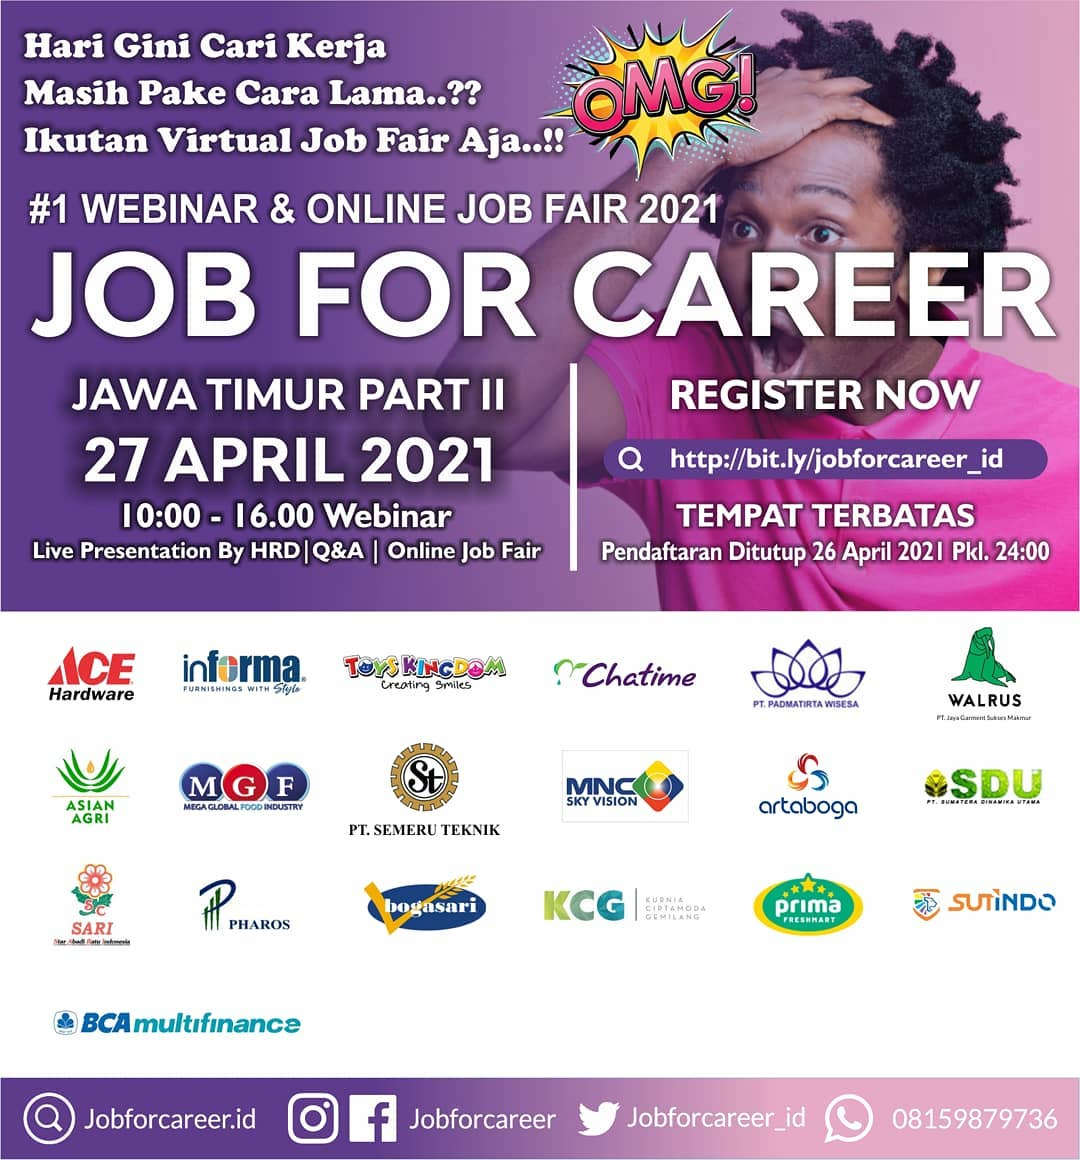 Job For Career JATIM Part 2